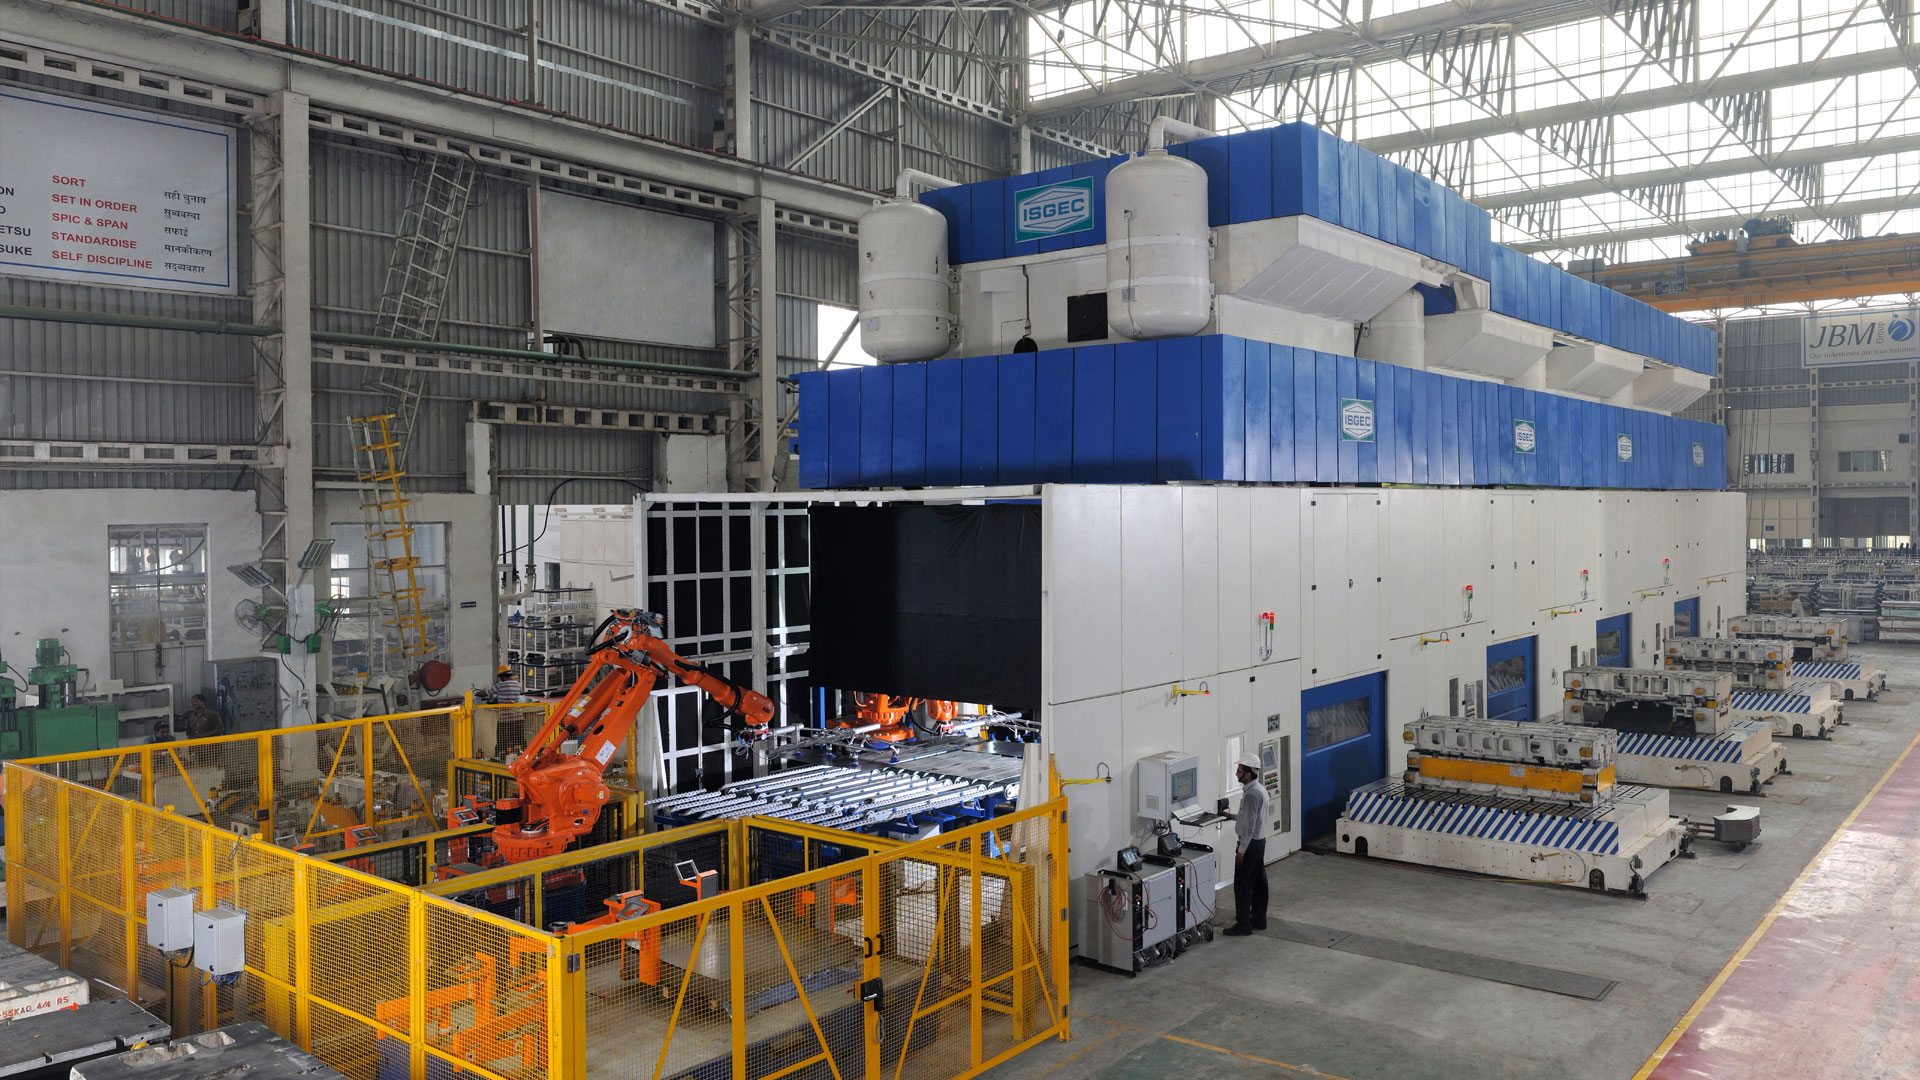 Isgec Heavy Engineering Heavy Engineering Equipment